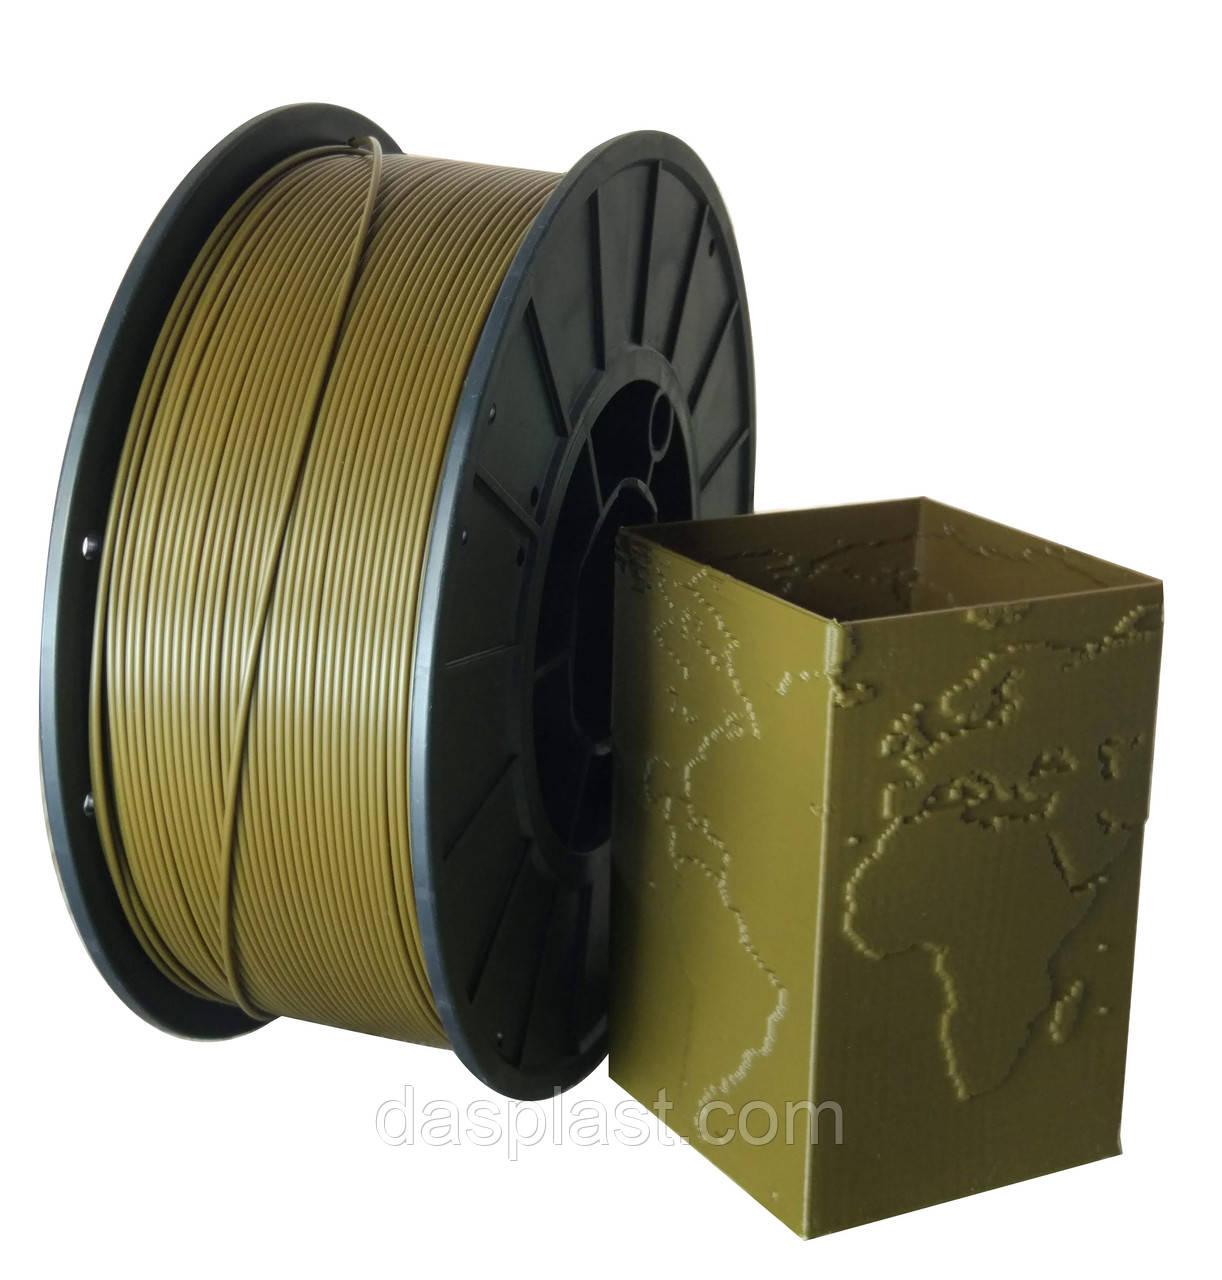 АБС нить цвет  хаки,1 кг, 1.75 мм пластик для 3d печати